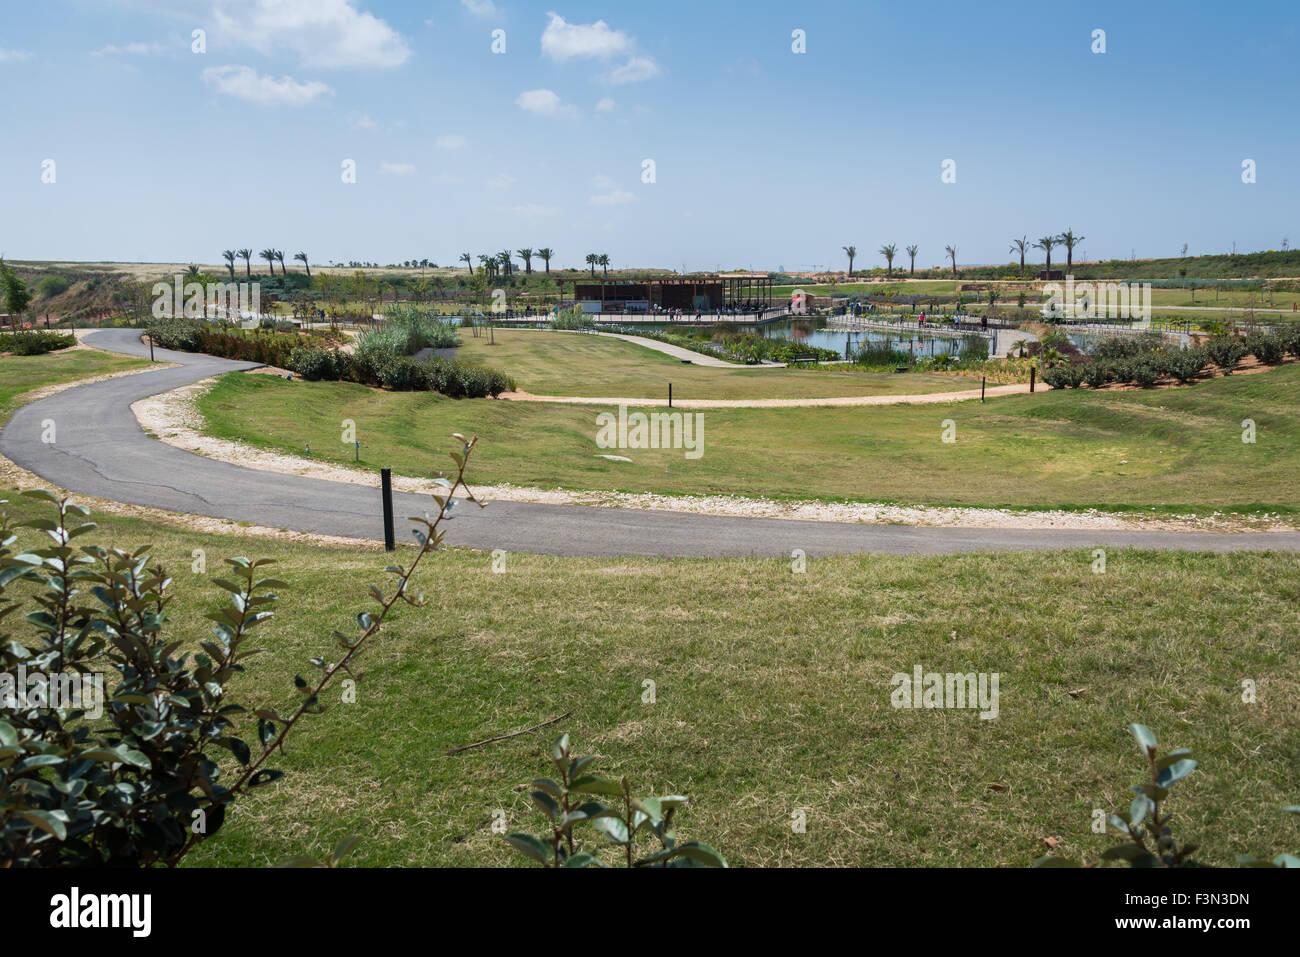 Visit to Hiriya (Ariel Sharon park), Israel - Stock Image